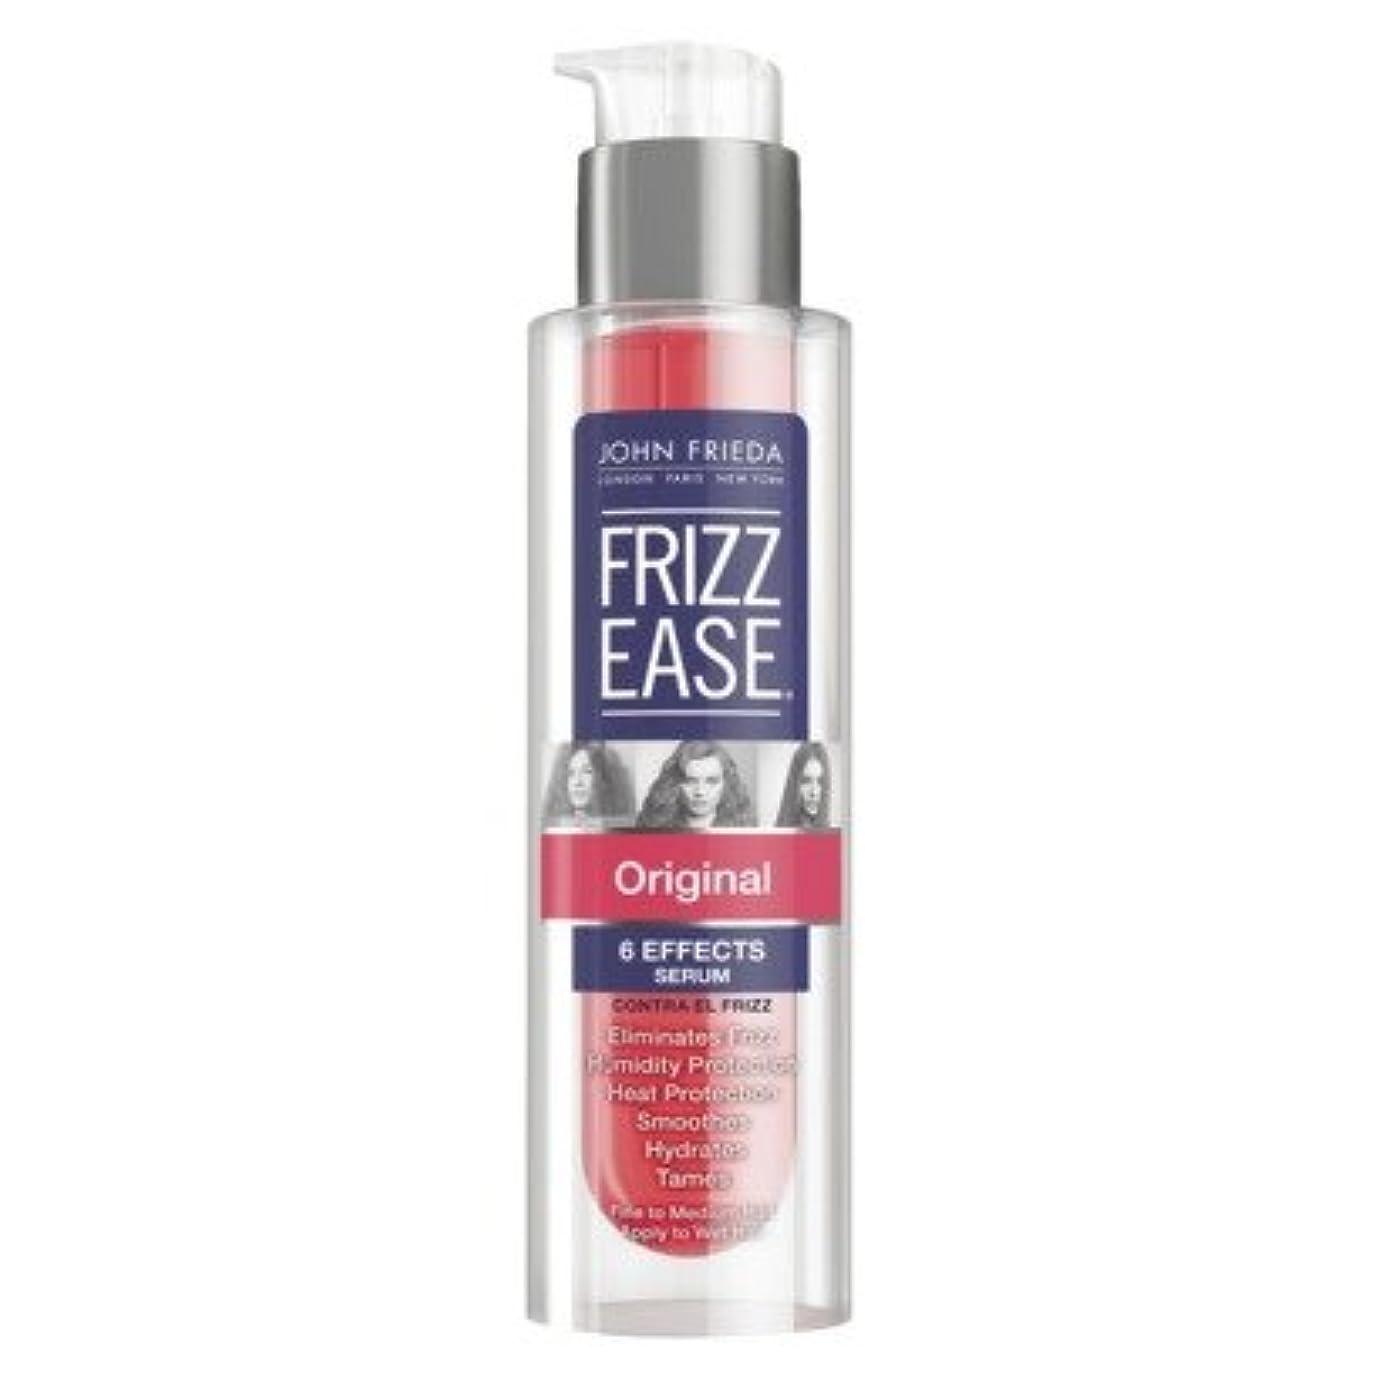 物理的な協力印象的John Frieda Frizz-Ease Hair Serum, Original Formula - 1.69 fl oz (49ml)